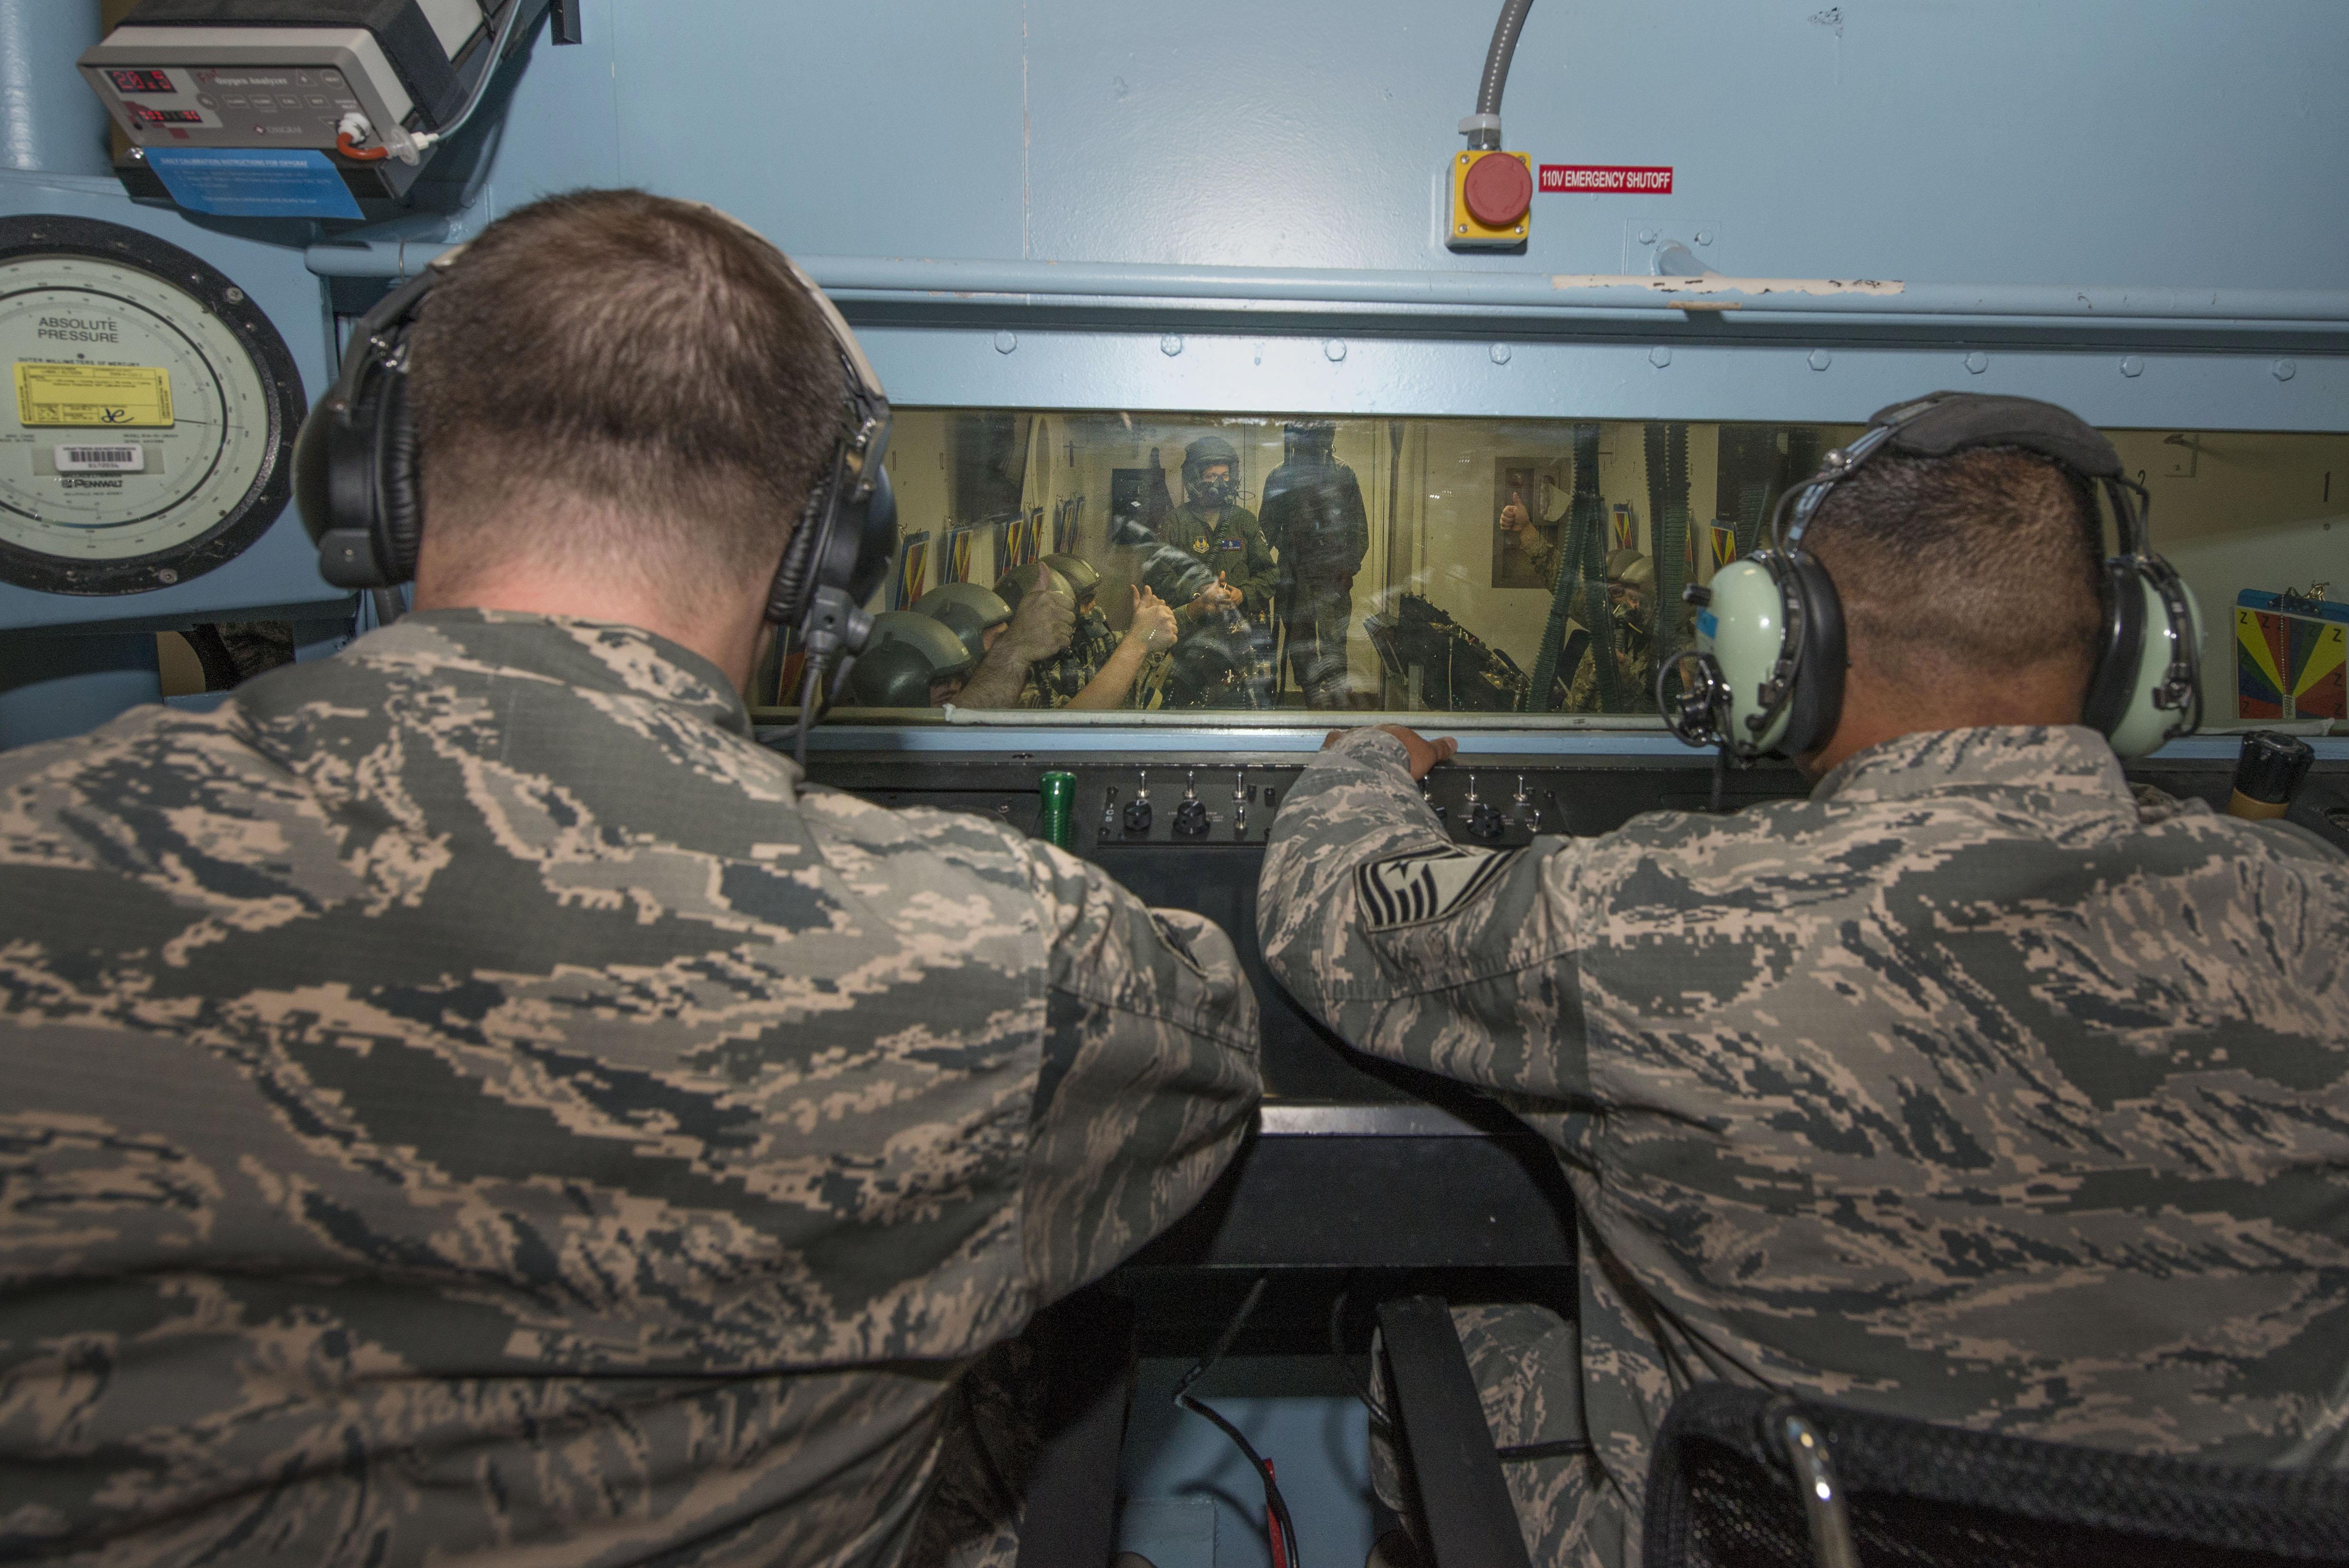 us air force tech sgt daniel zerbe left school of aerospace